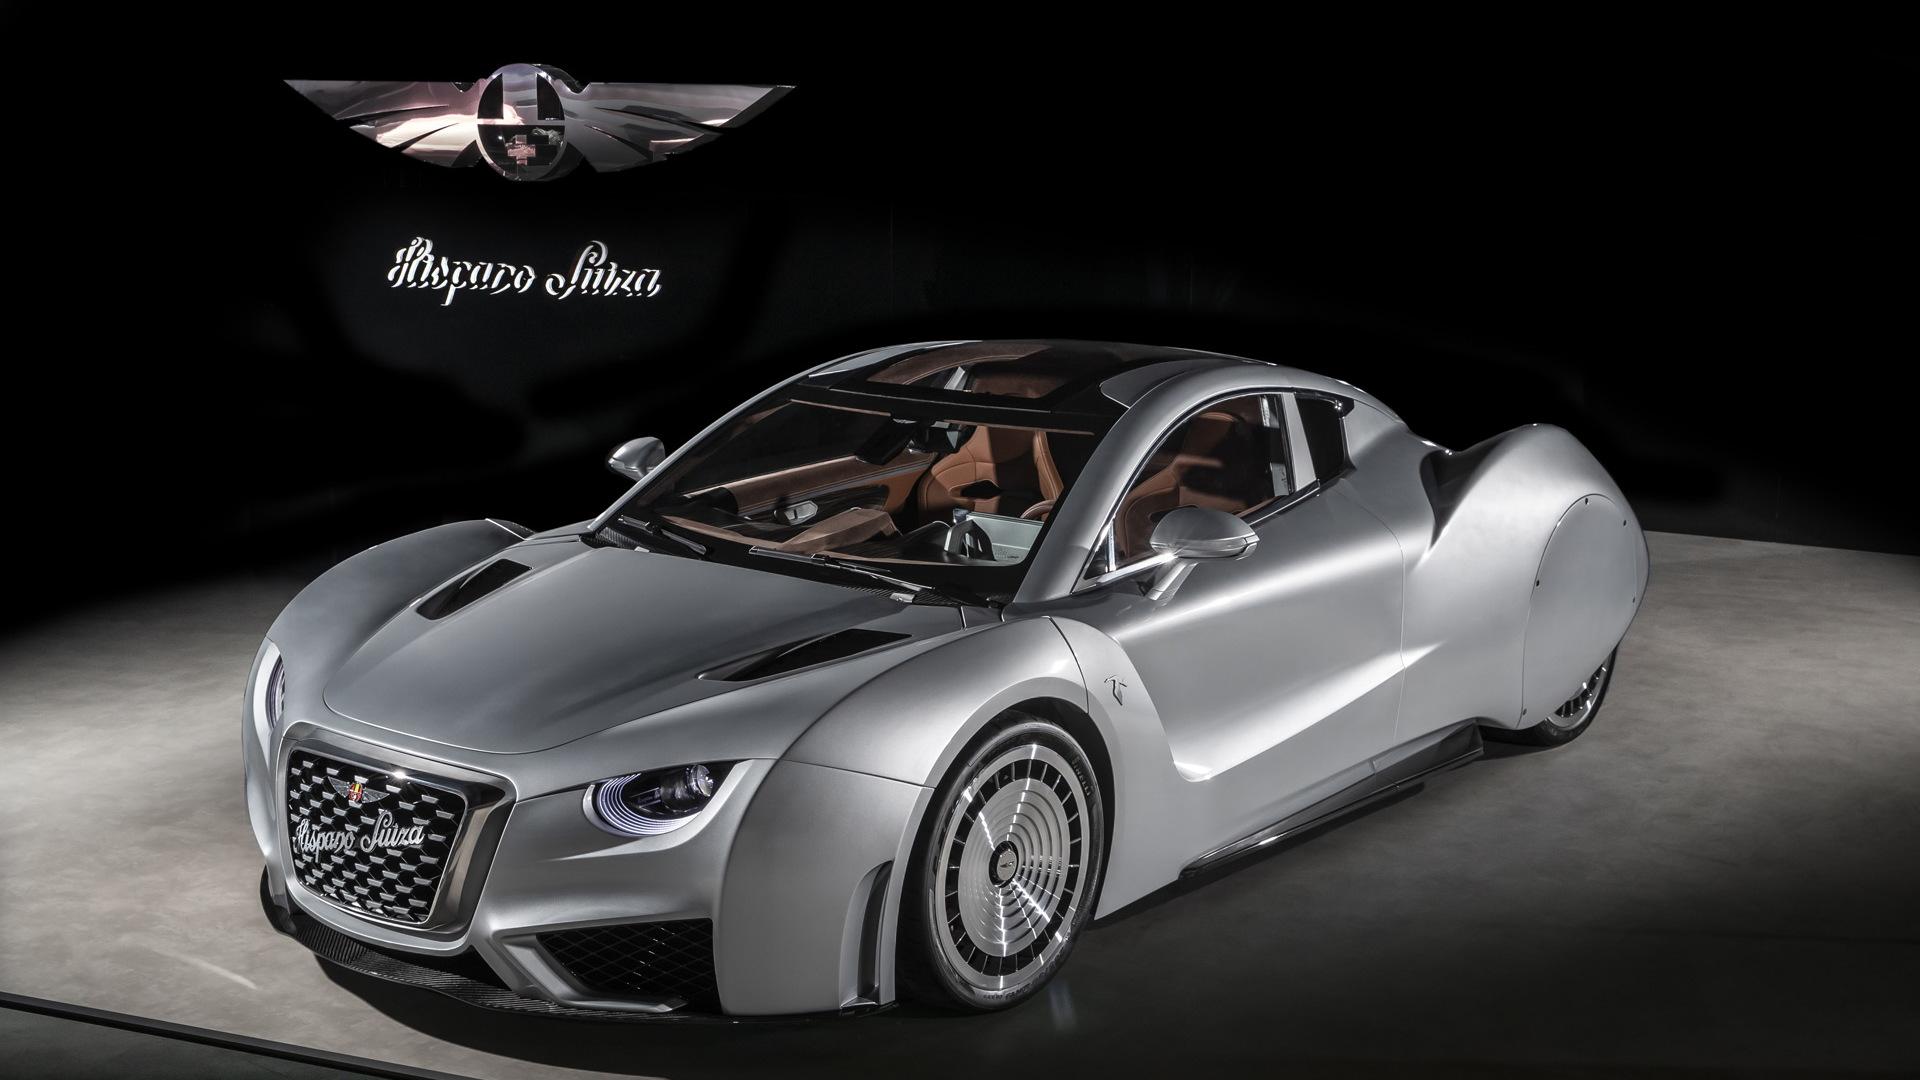 Hispano-Suiza Carmen